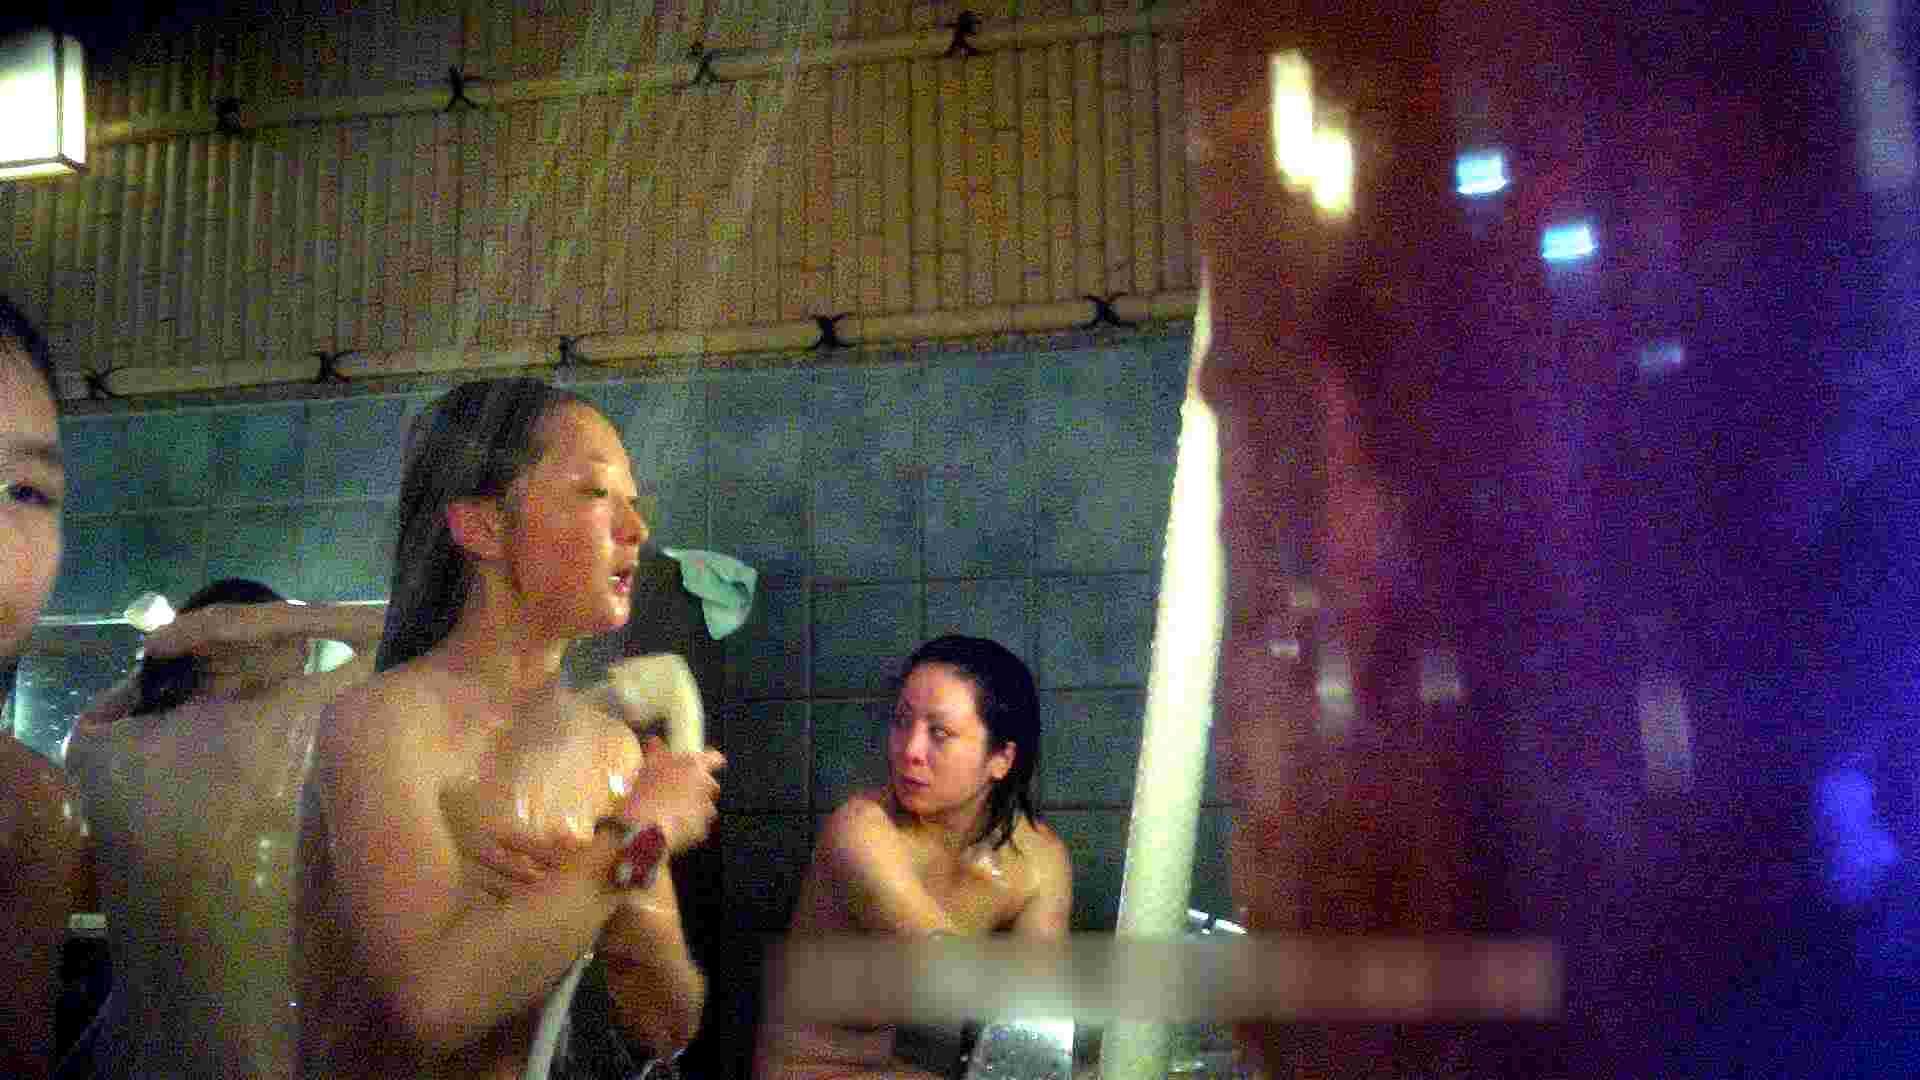 TG.12 【上等兵】いやぁ若い!ぷっちぷちギャル!でも時間短い・・・ 貧乳 オメコ無修正動画無料 43画像 34